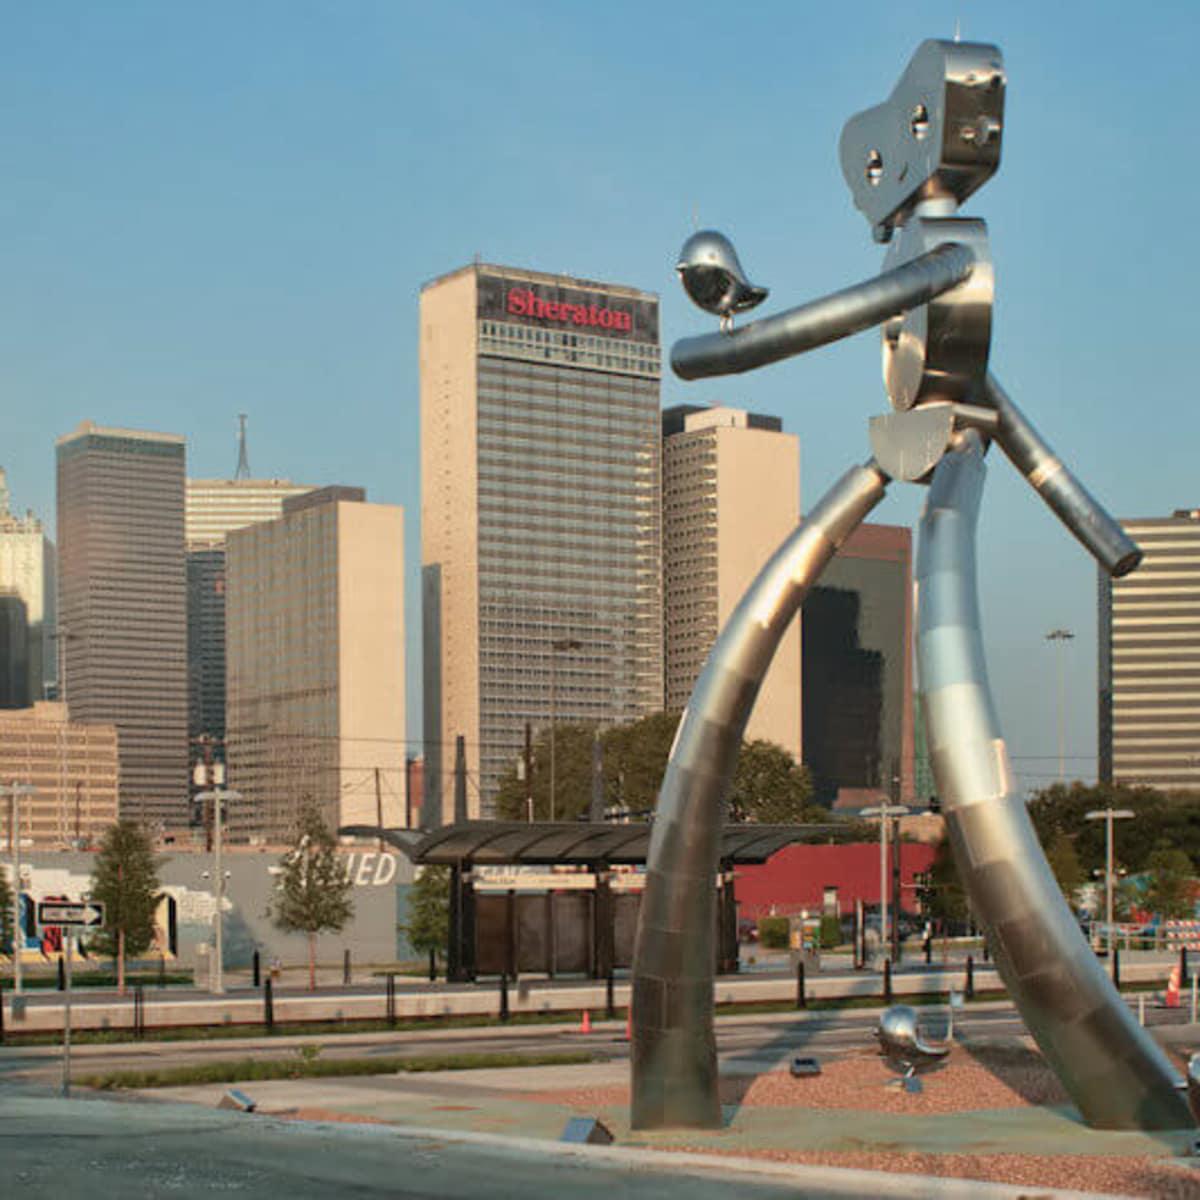 Deep Ellum historic district in Dallas